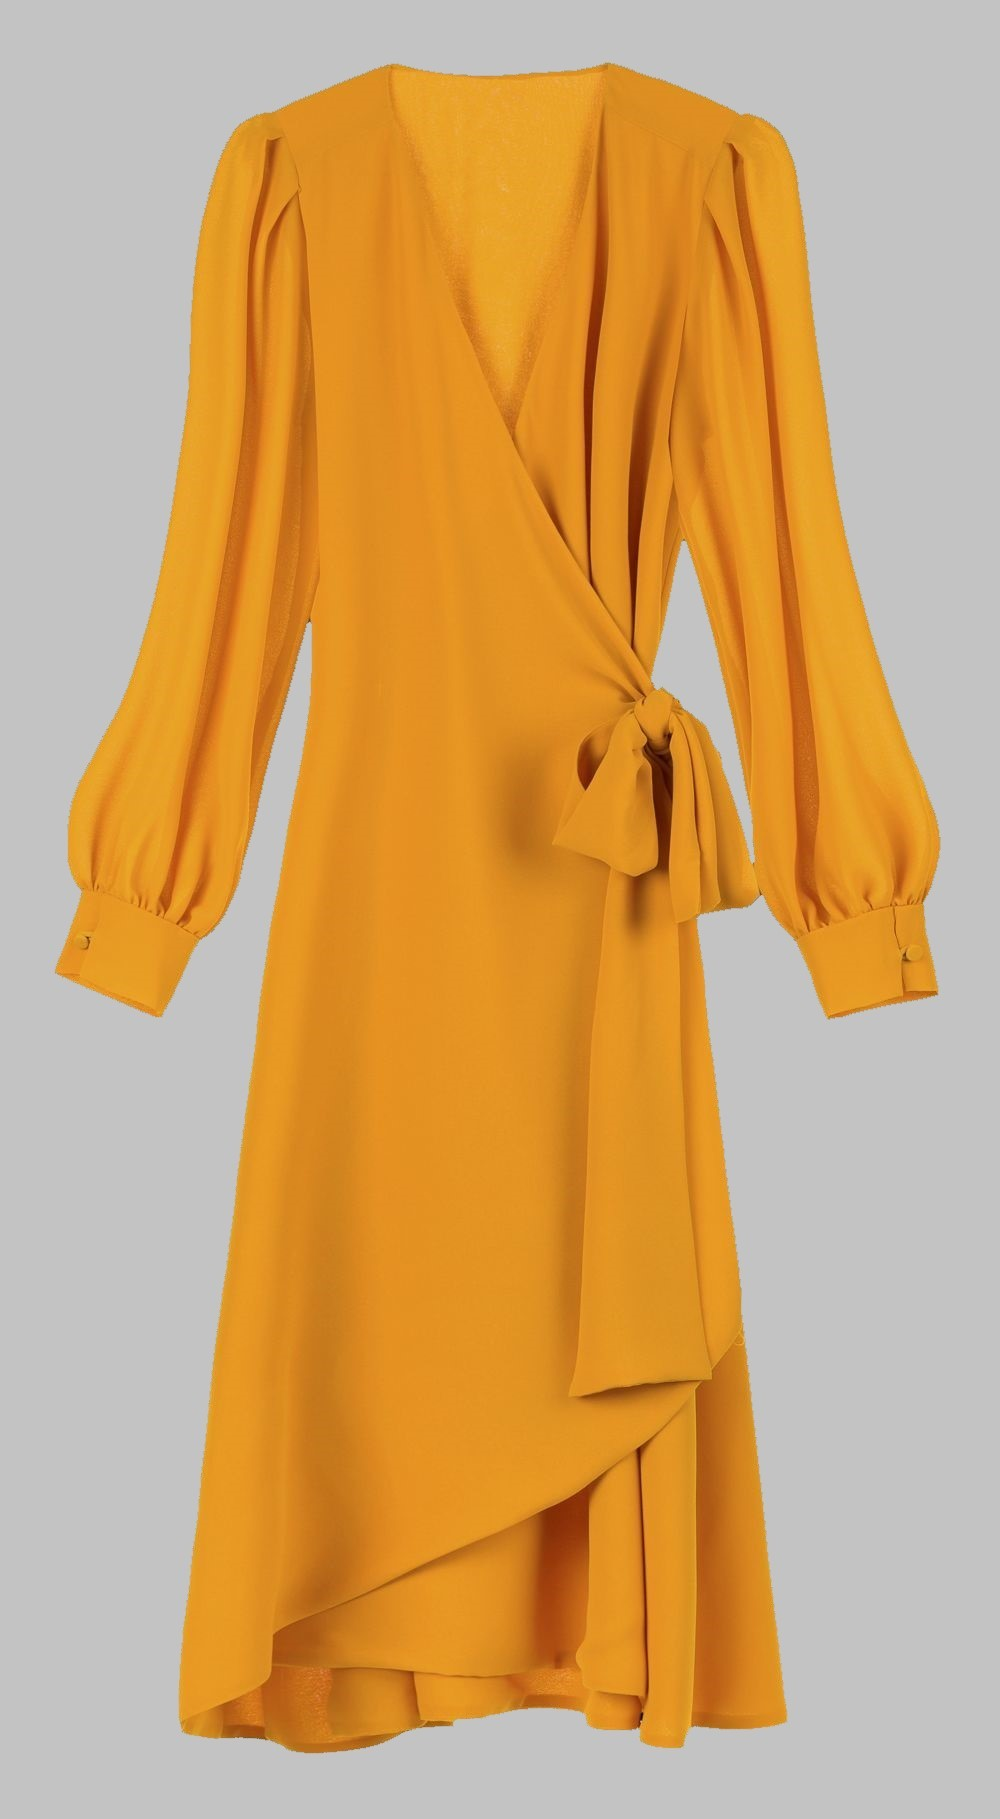 Vestido cruzado amarillo, Bimani.